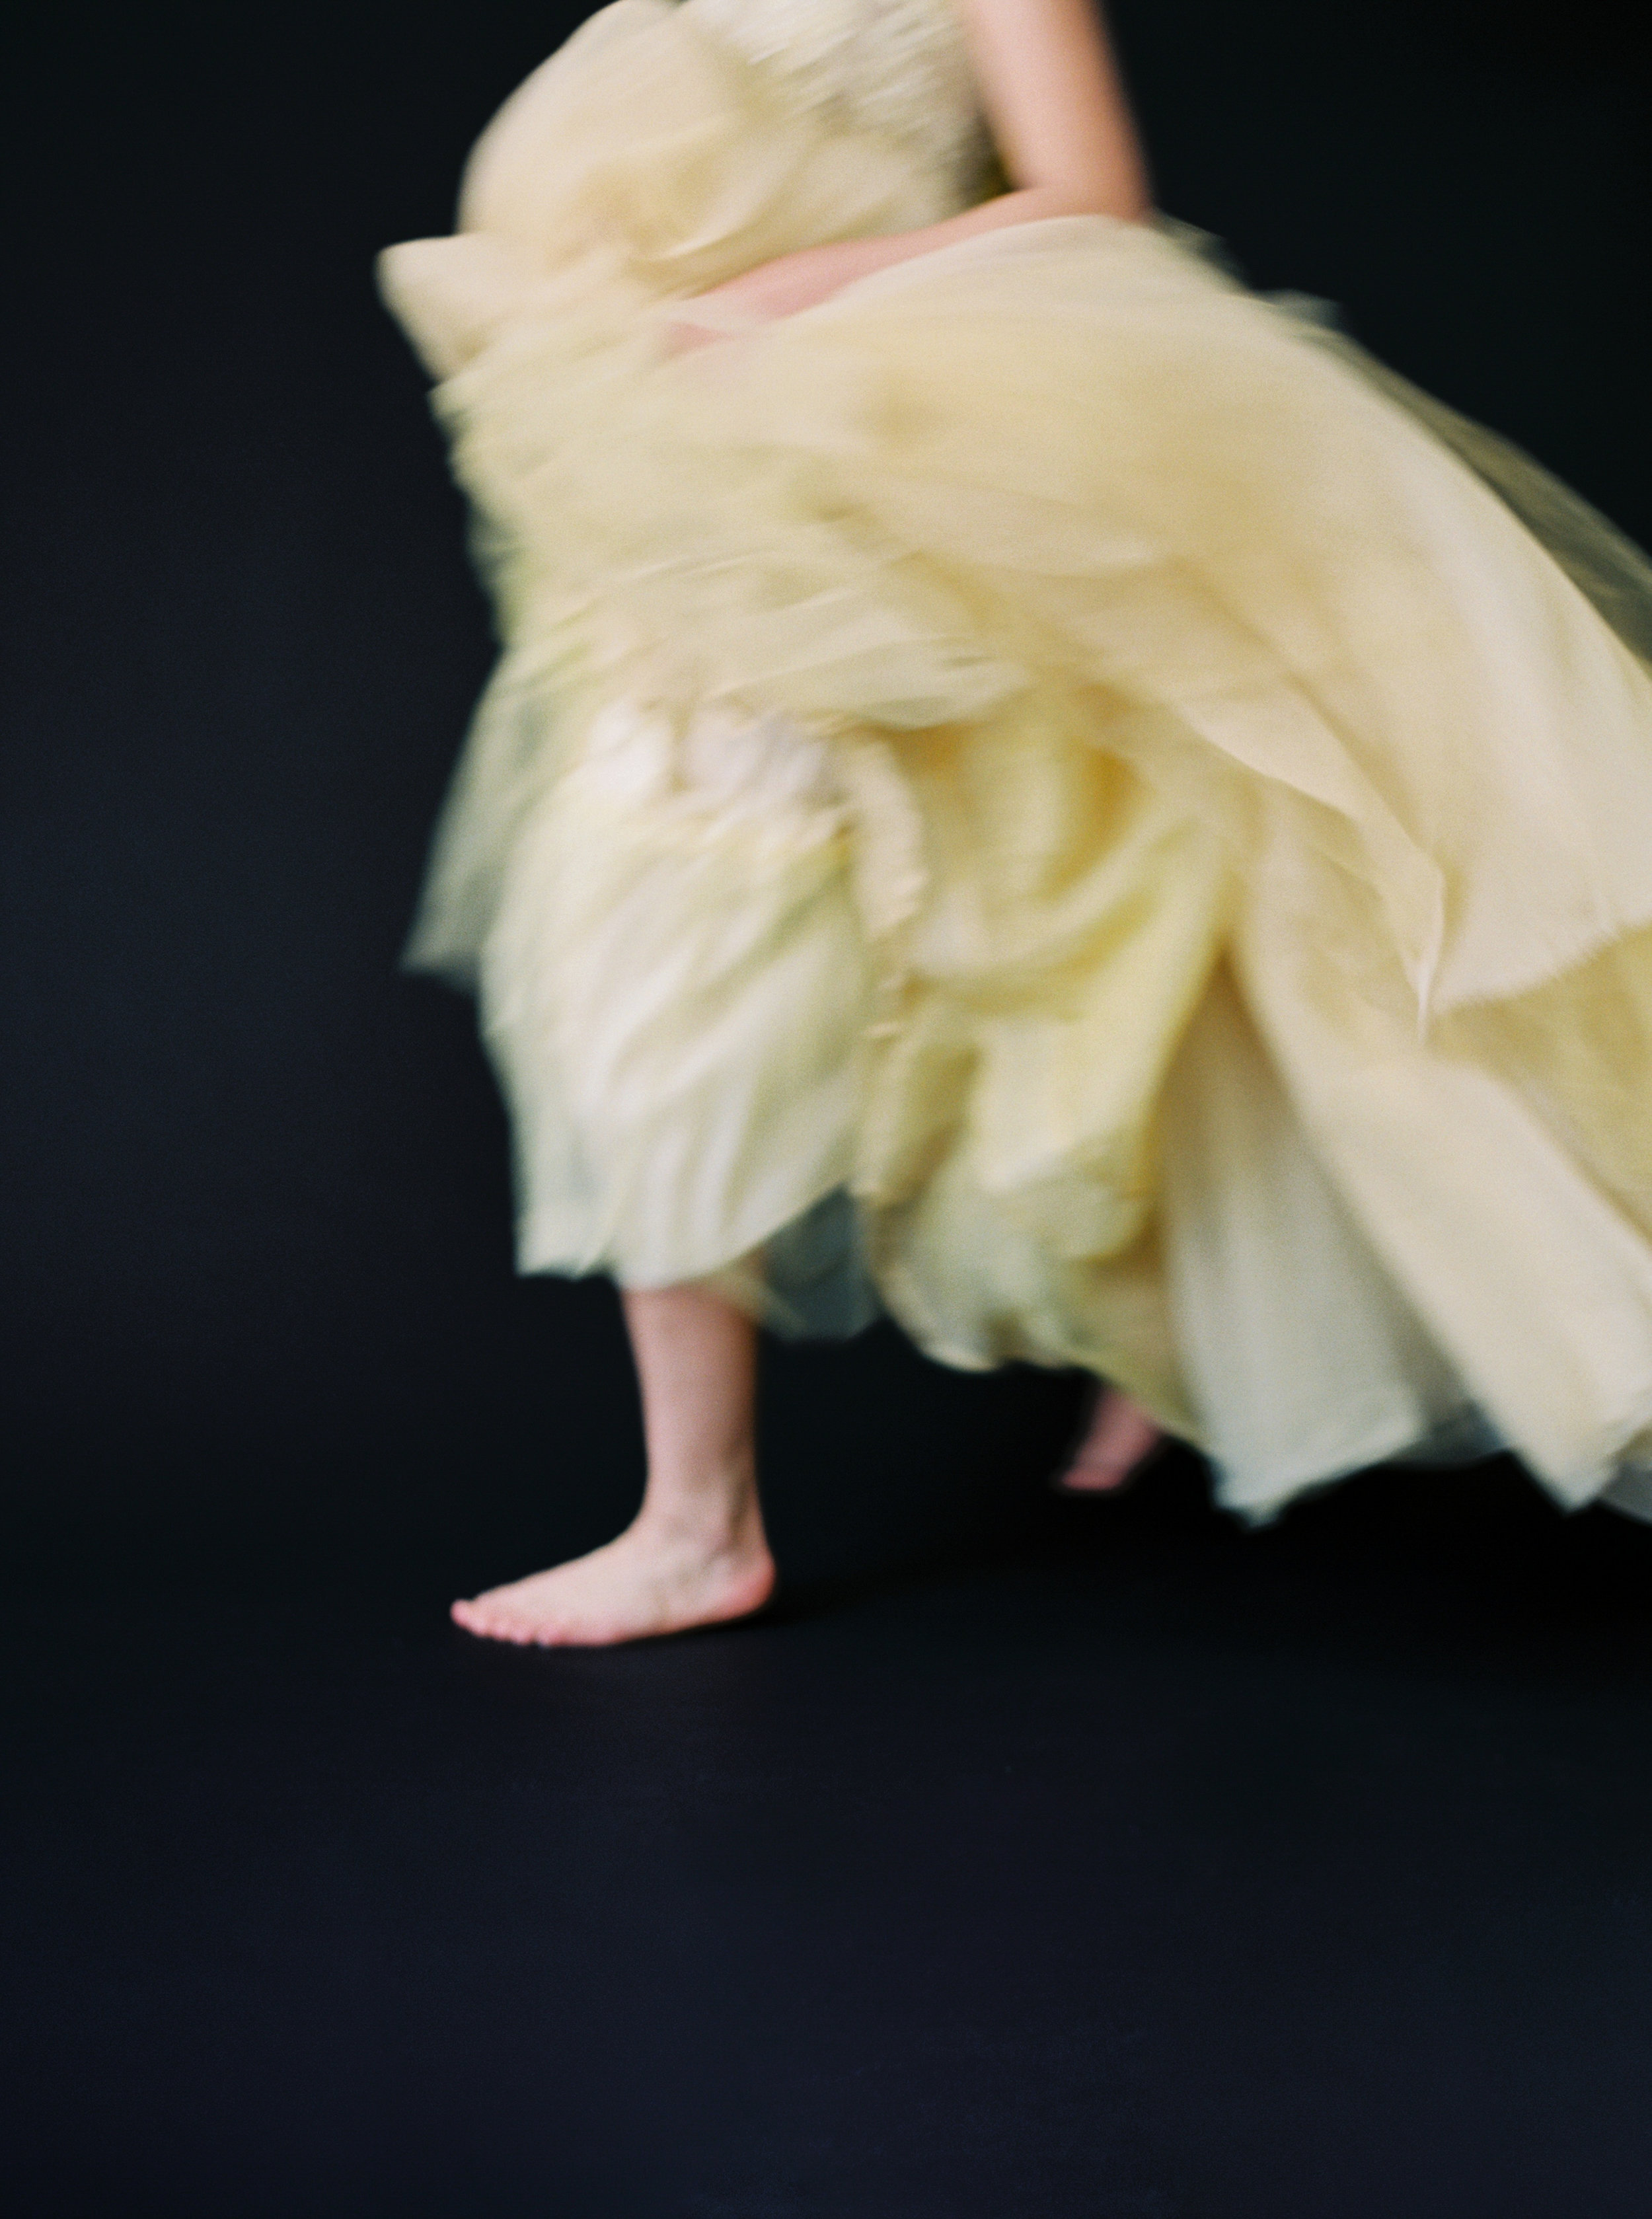 Carlos-Hernandez-Photography-029.jpg